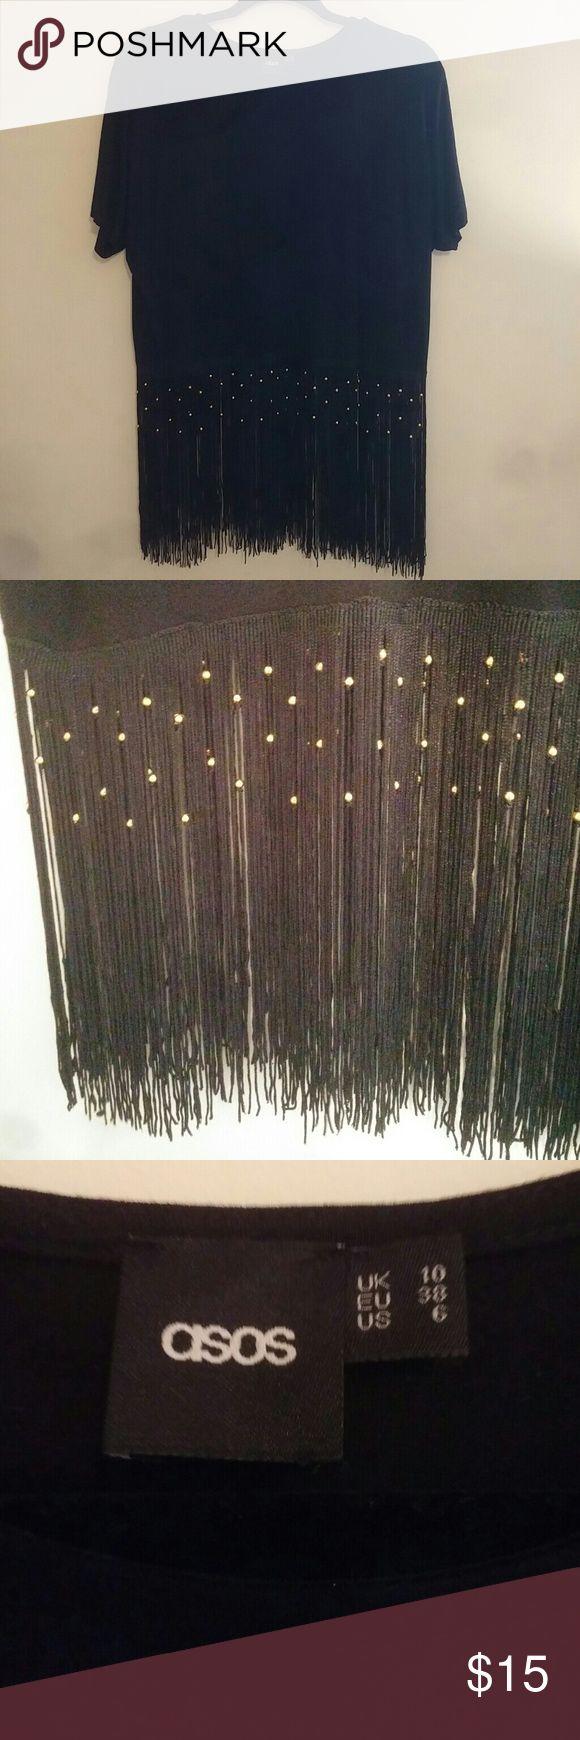 ASOS black fringe beaded shirt Black ASOS fringe shirt with gold beading! I've only worn it once or twice! Asos Tops Tees - Short Sleeve